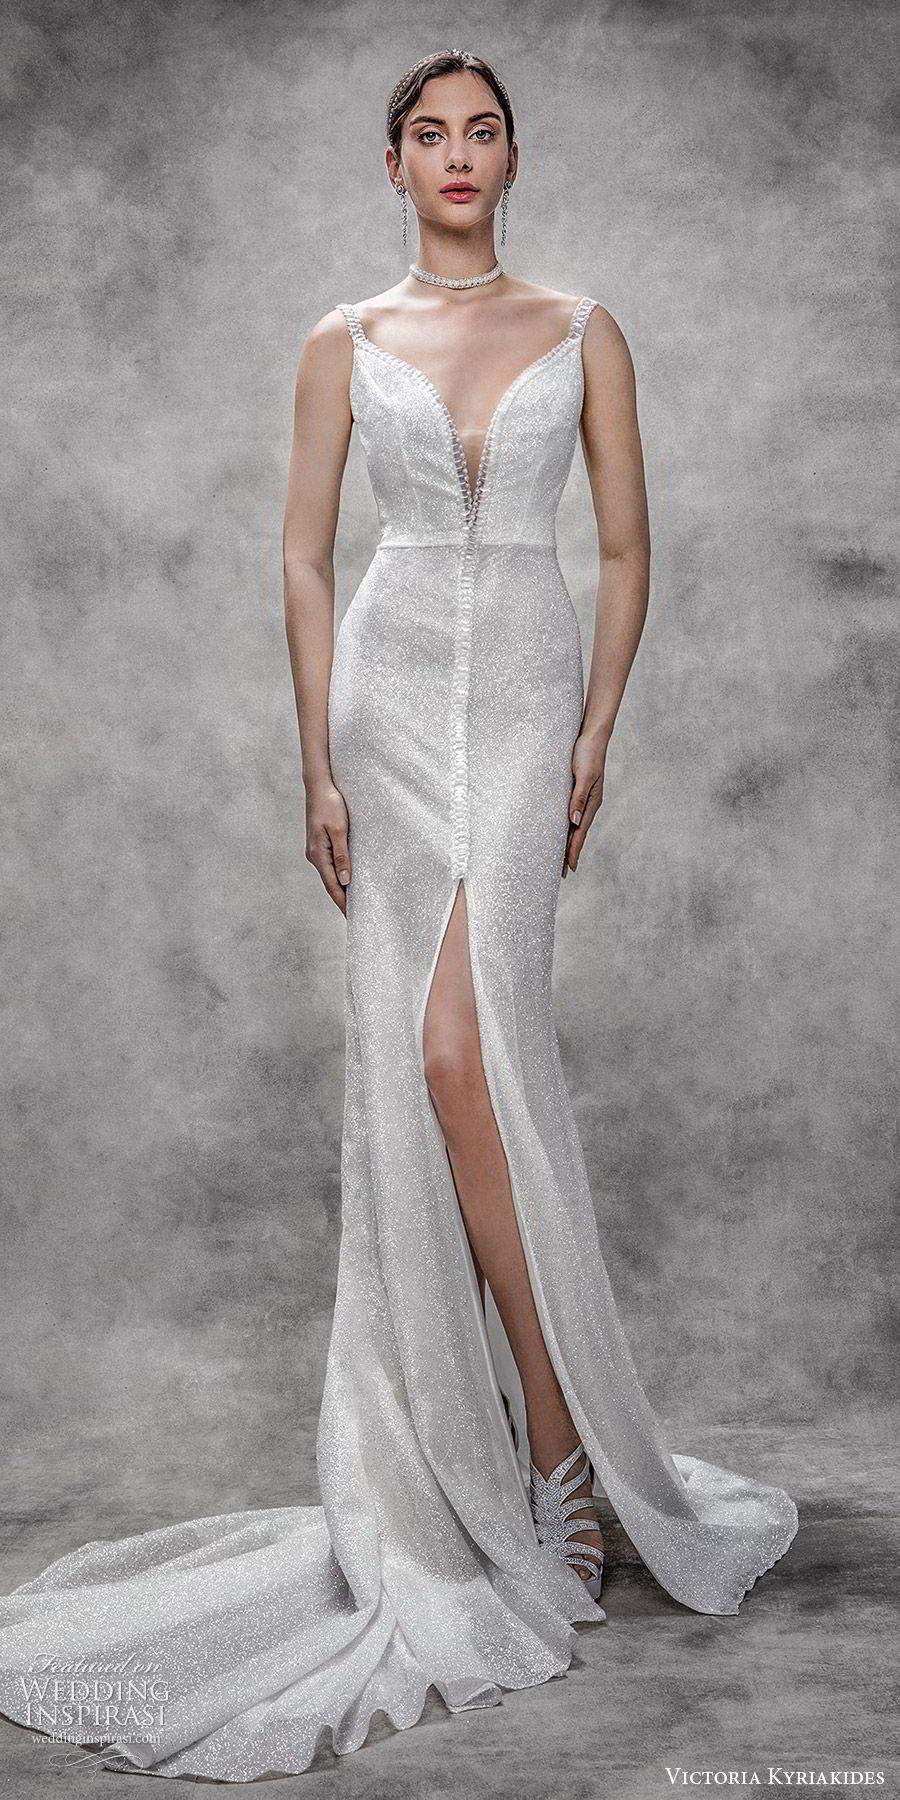 victoria kyriakides spring 2020 bridal sleeveless beaded straps split sweetheart neckline fully embellished sheath wedding dress (8) glitzy glam elegant chapel train slit skirt mv